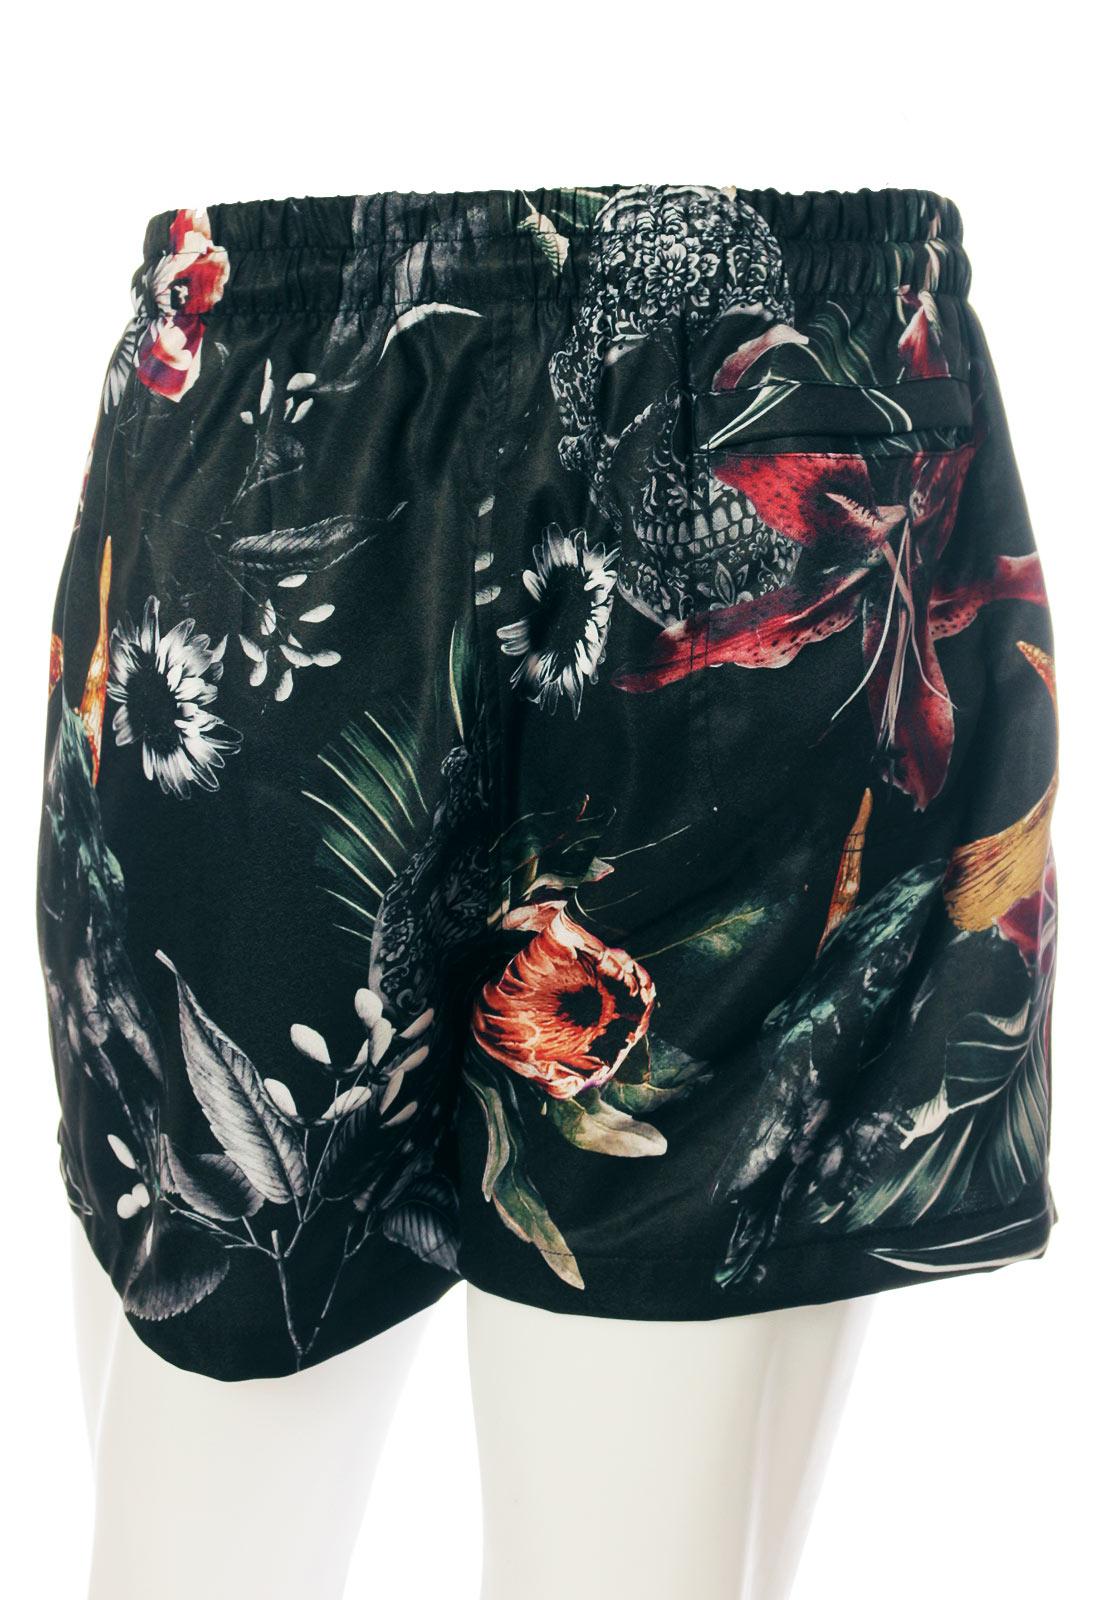 Shorts Estampado Floral Sem Gênero Caveiras Dark Preto